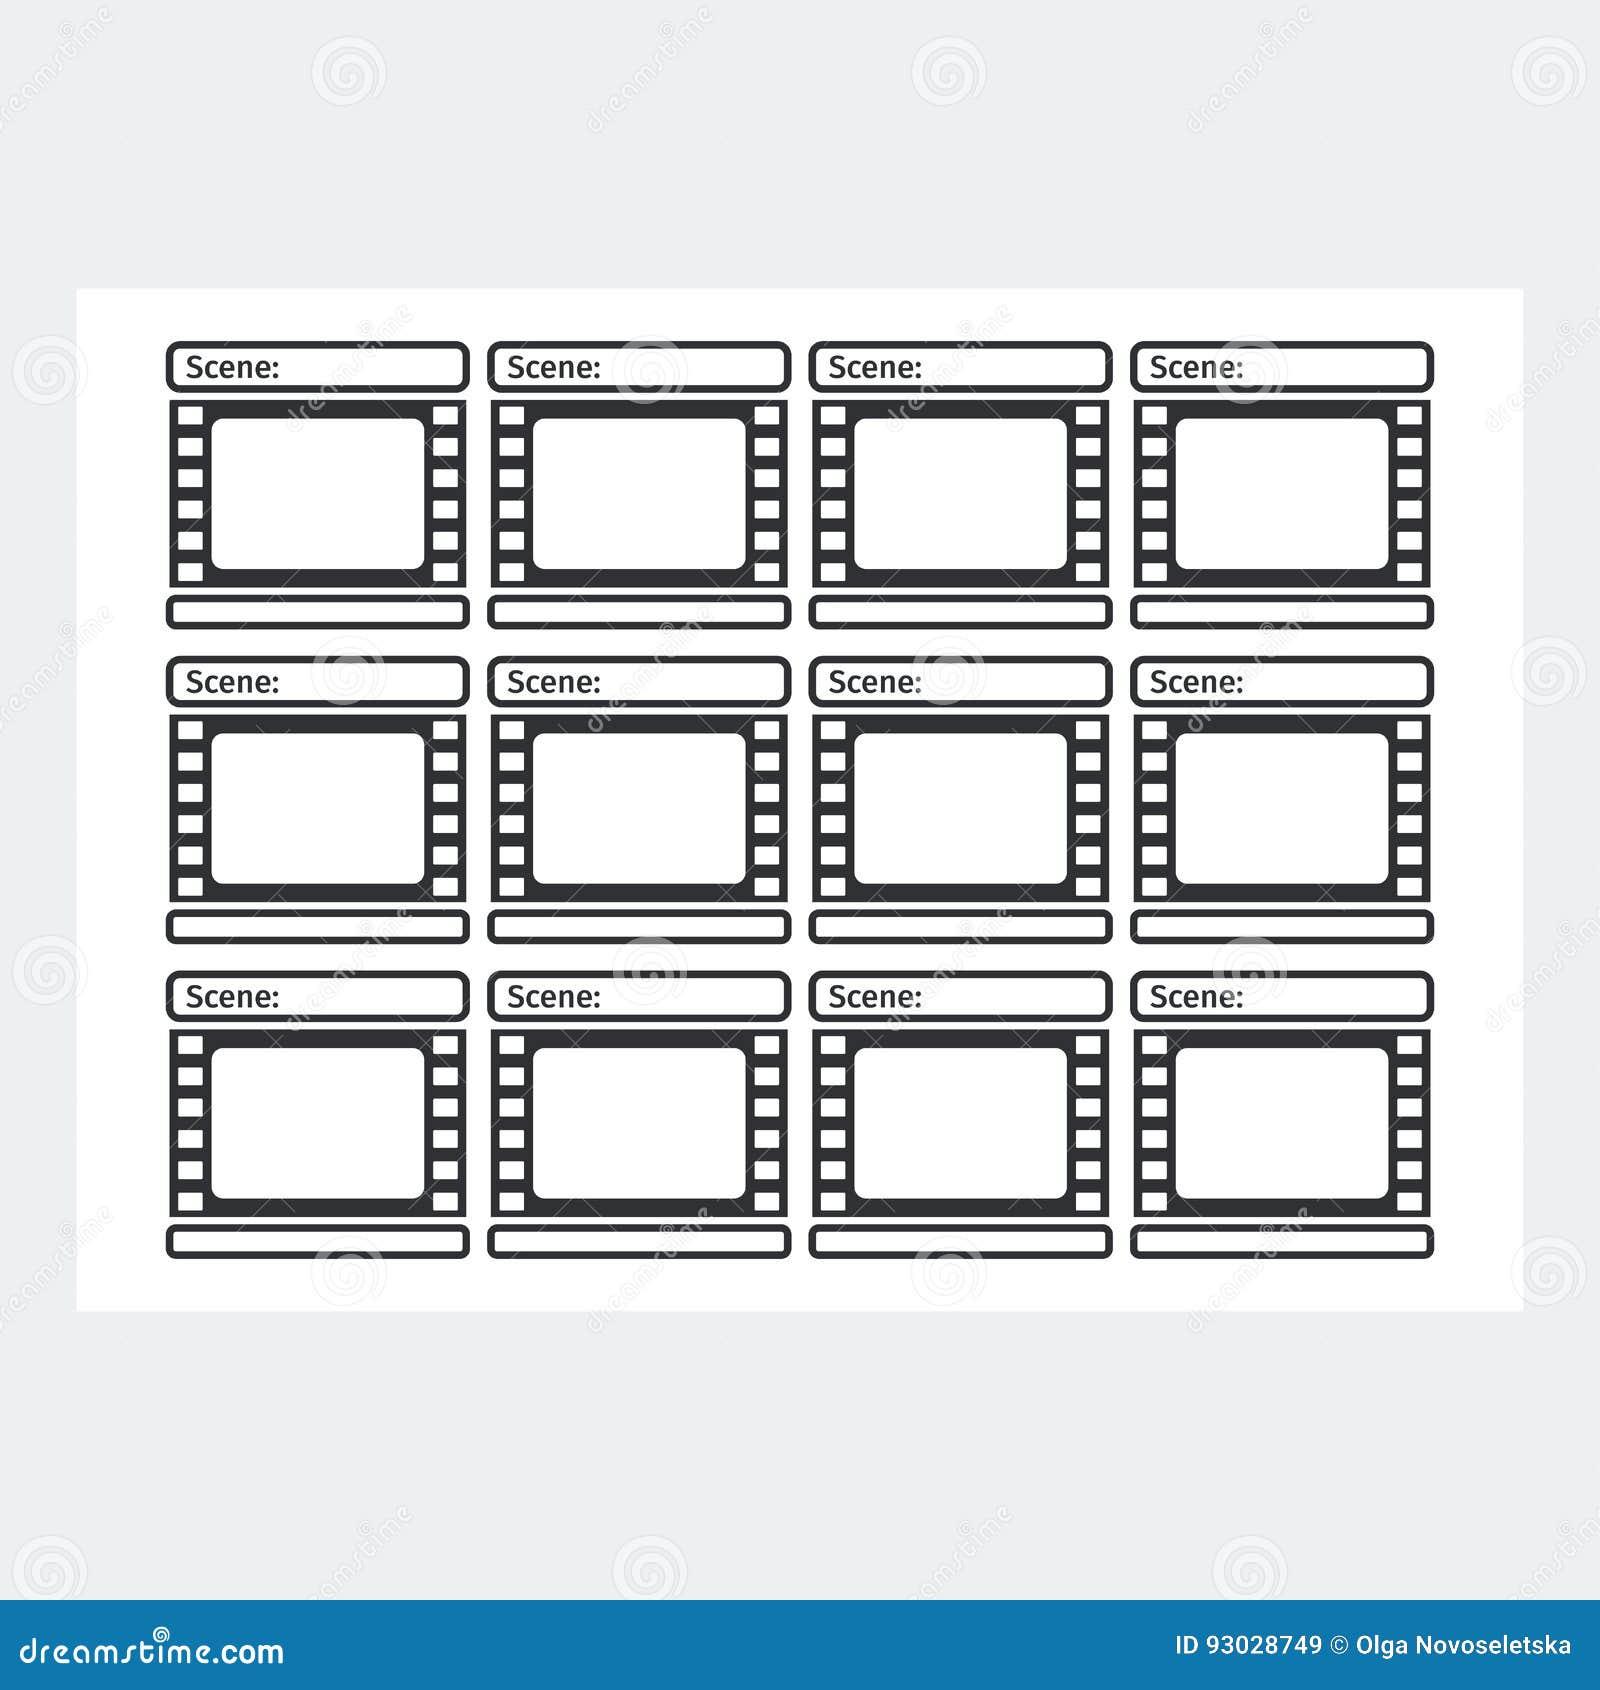 Storyboard template reel stock vector. Illustration of illustration ...